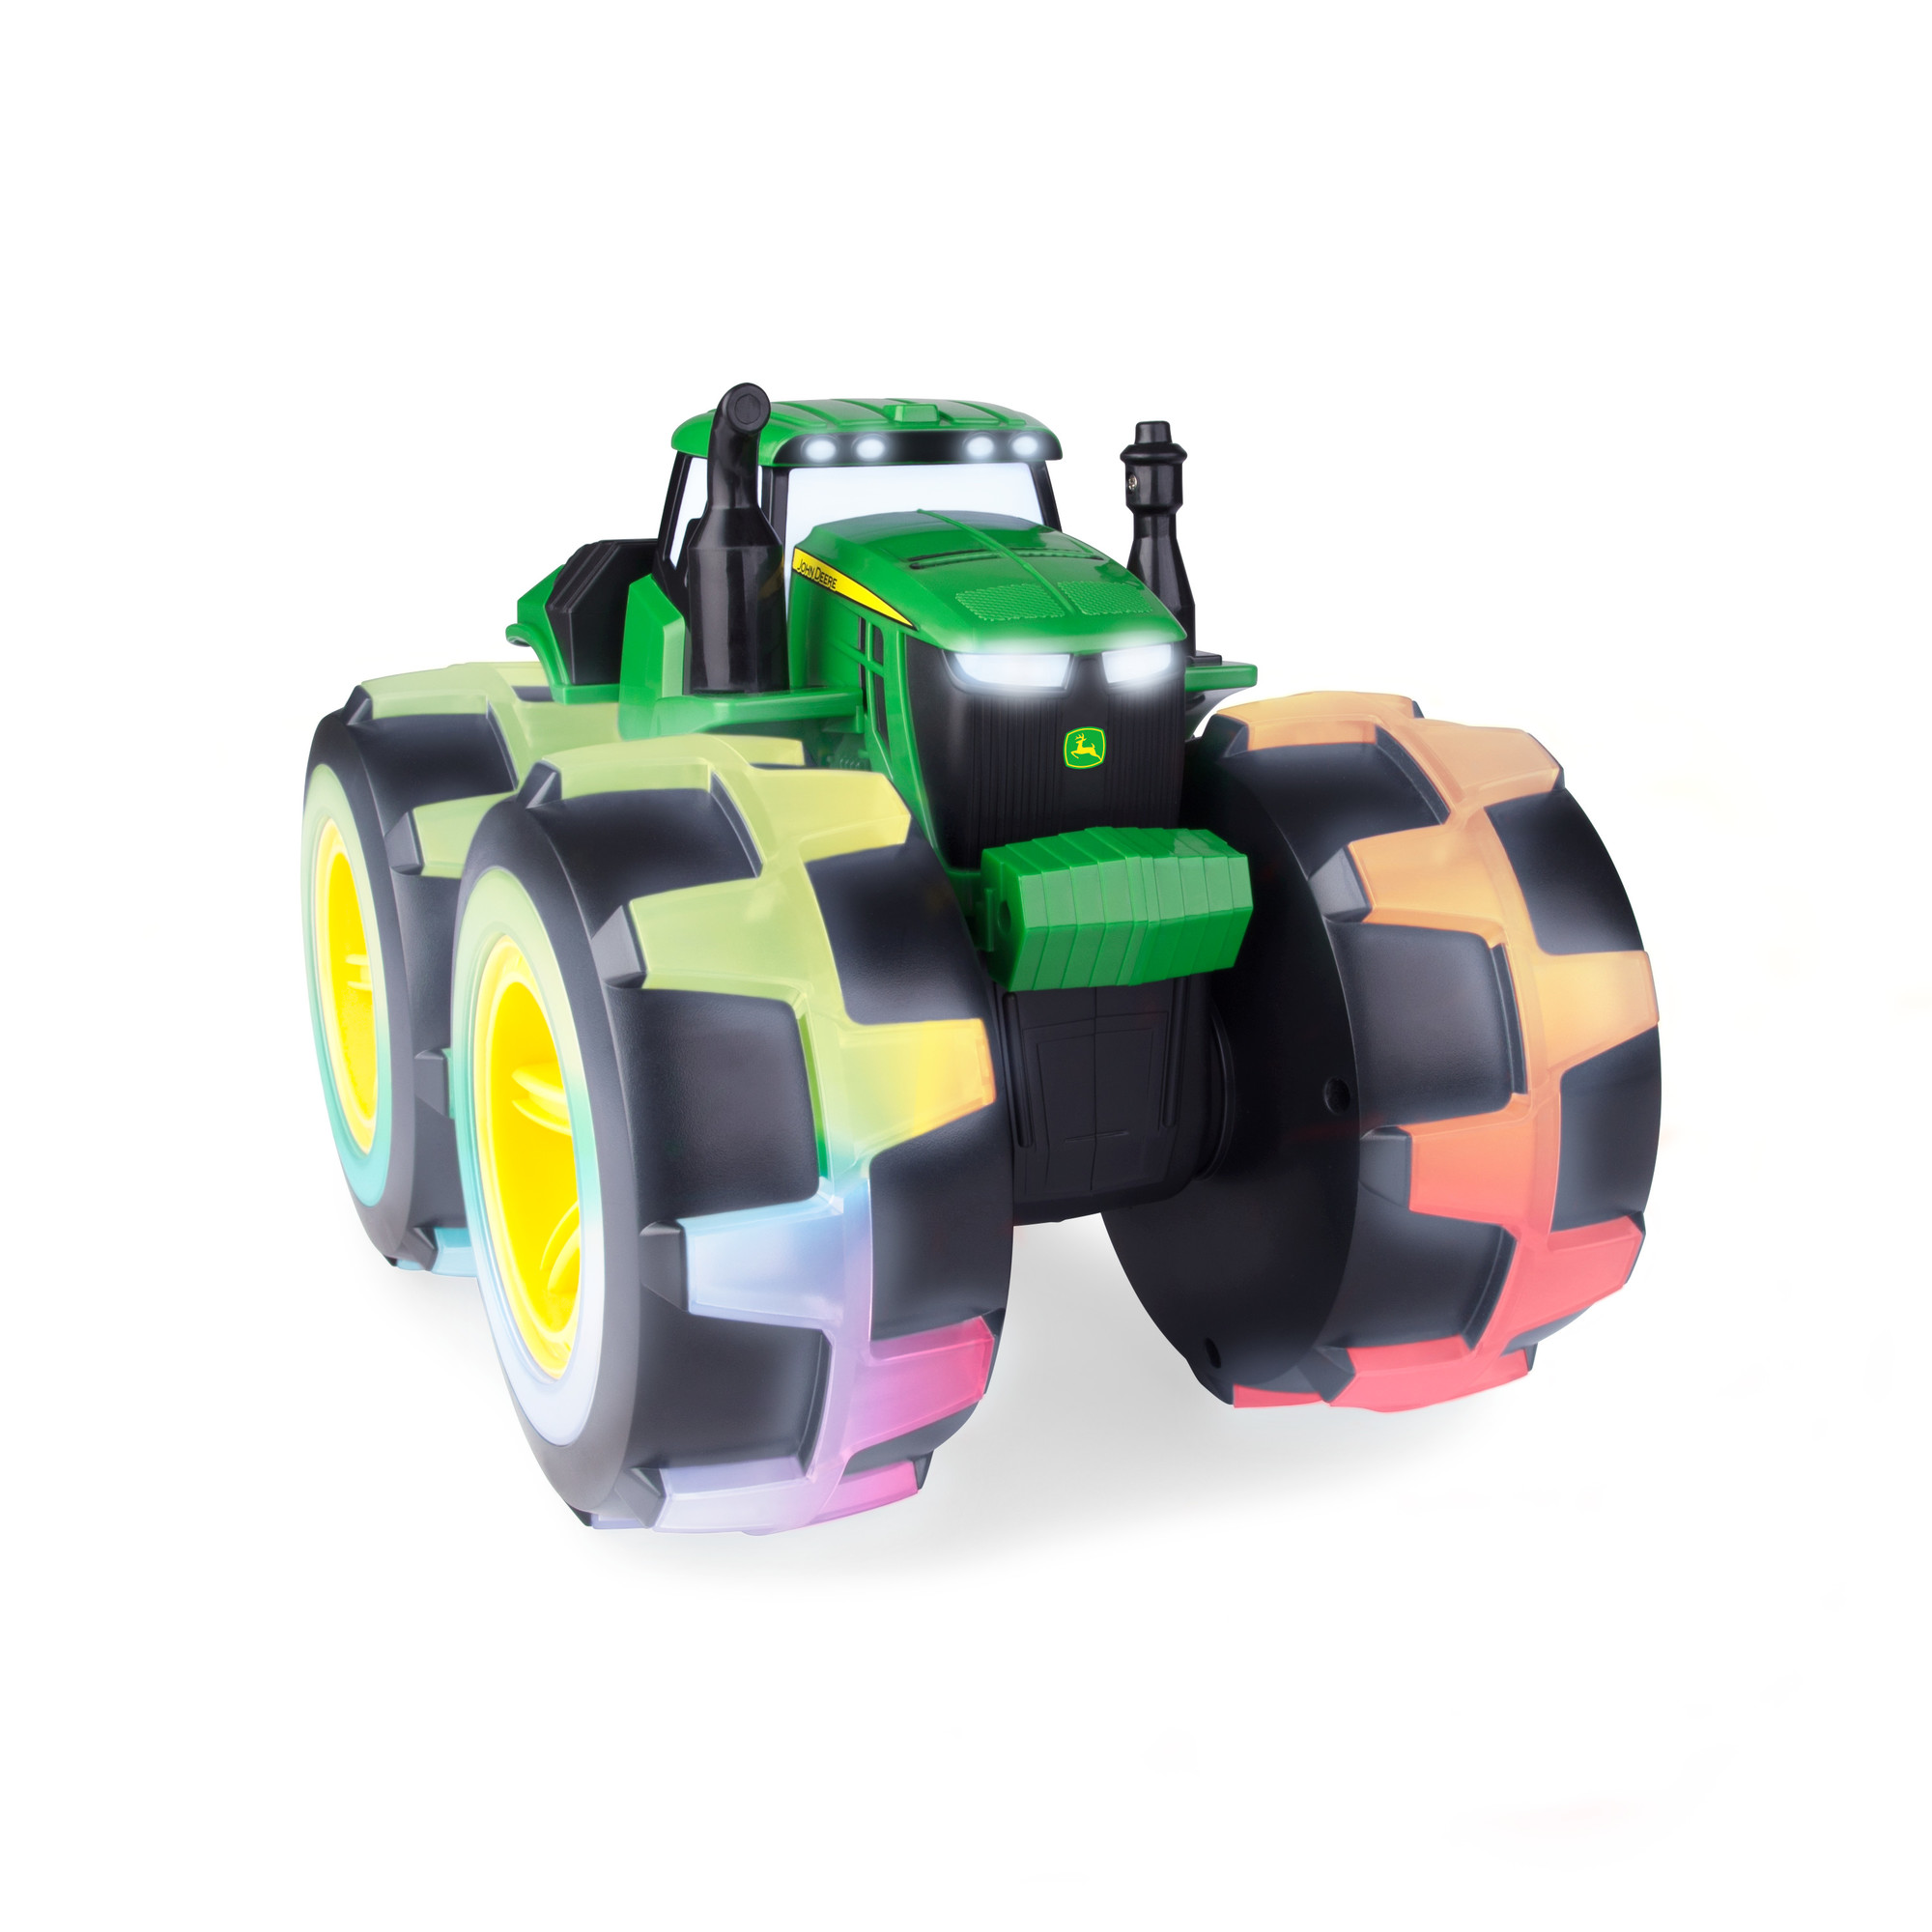 John Deere Monster Treads Deluxe Lightning Wheels Tractor by Tomy Inc